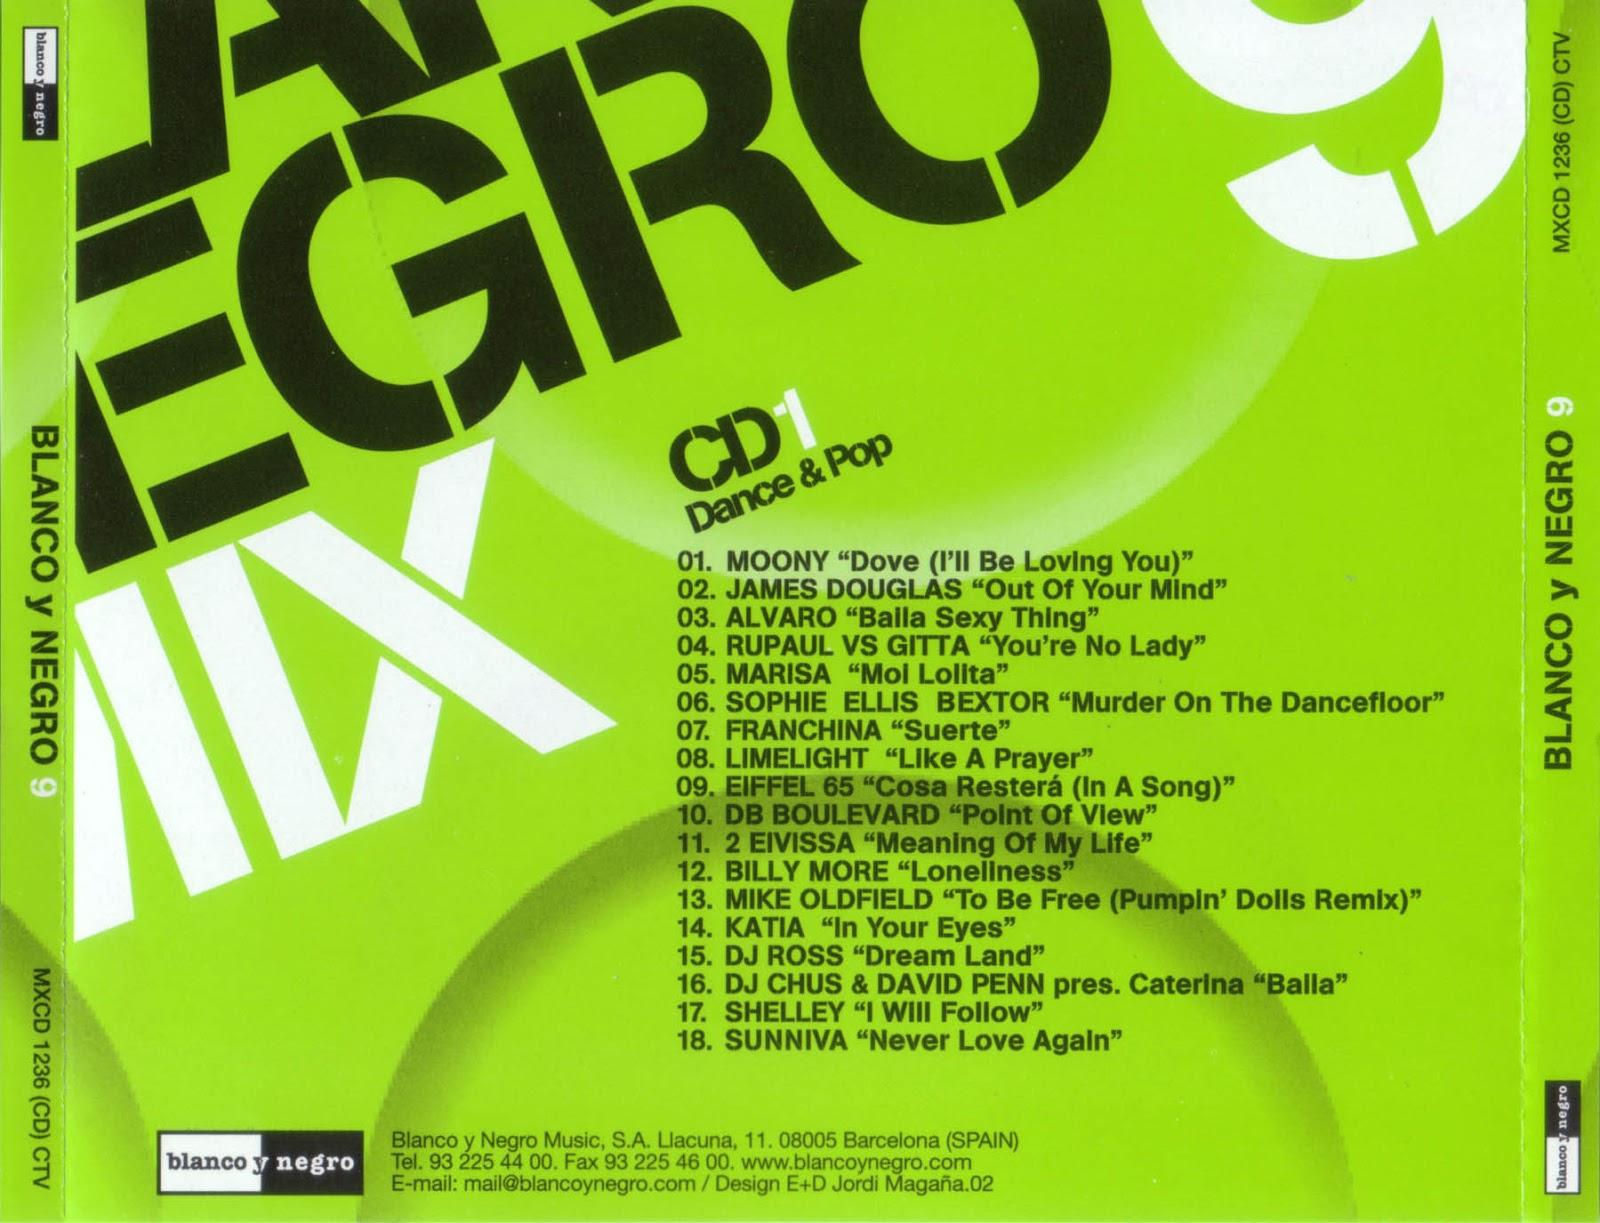 dance of the 90's: Blanco y Negro Mix 9